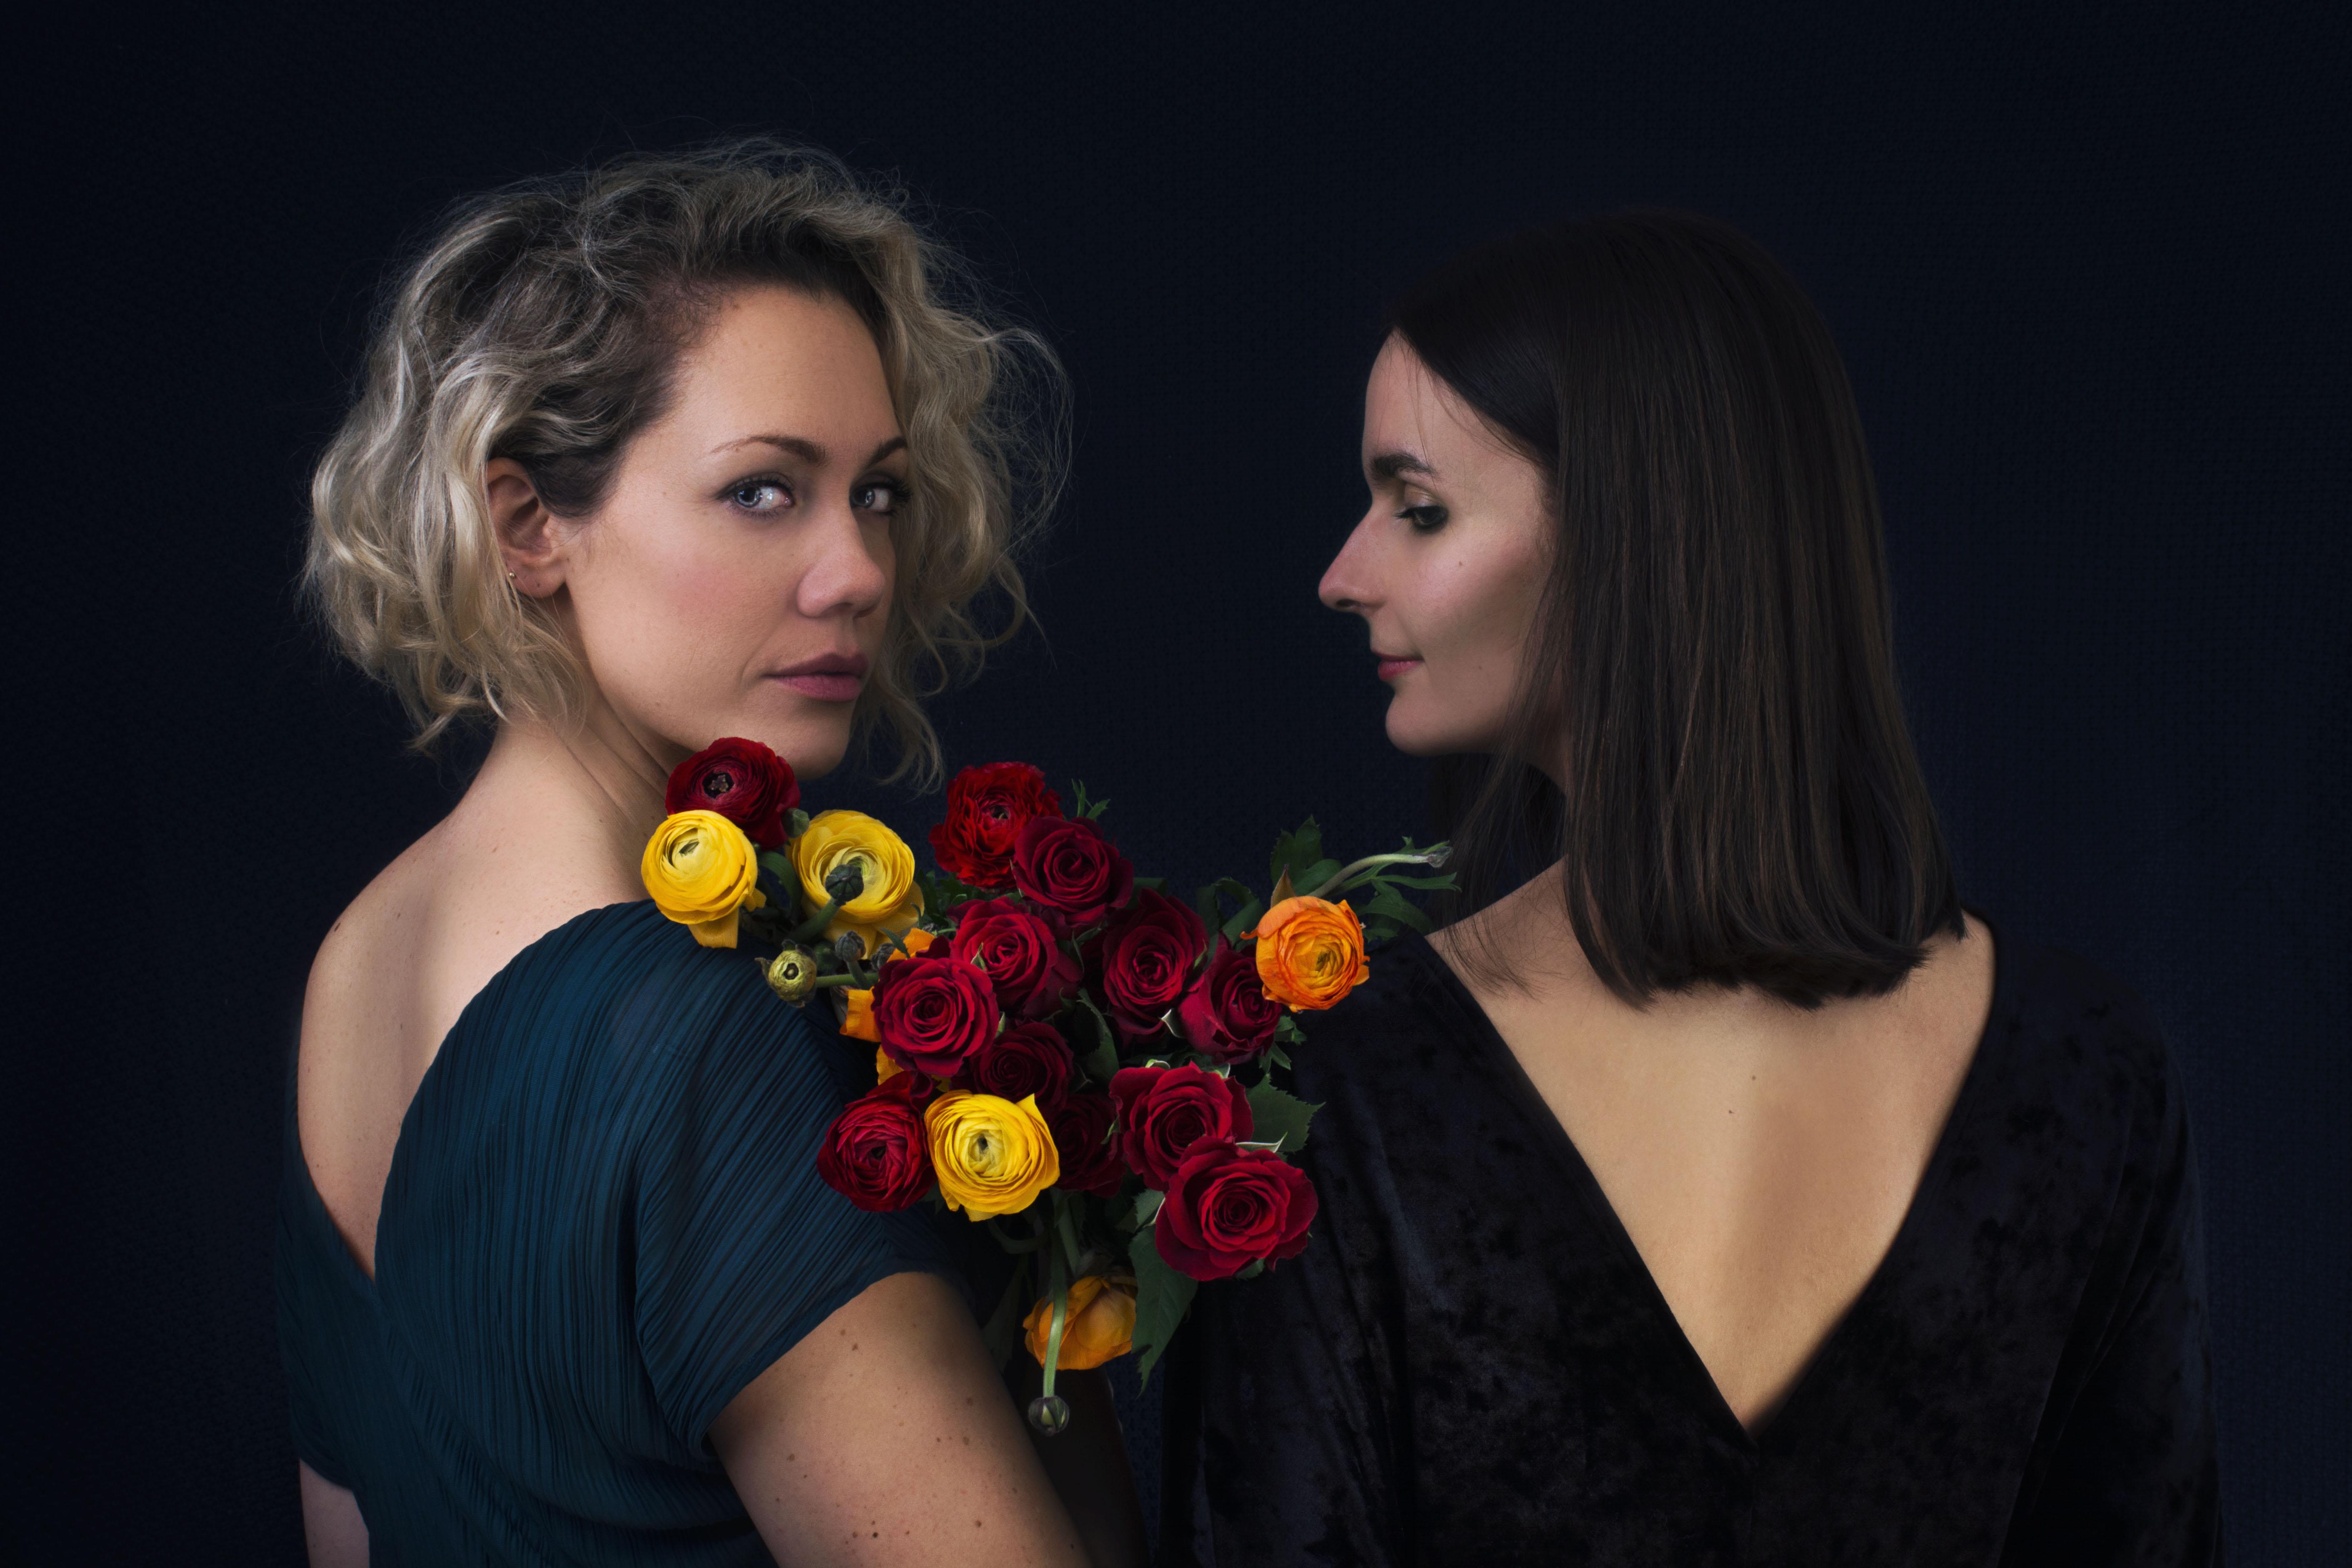 Flowers & portraits